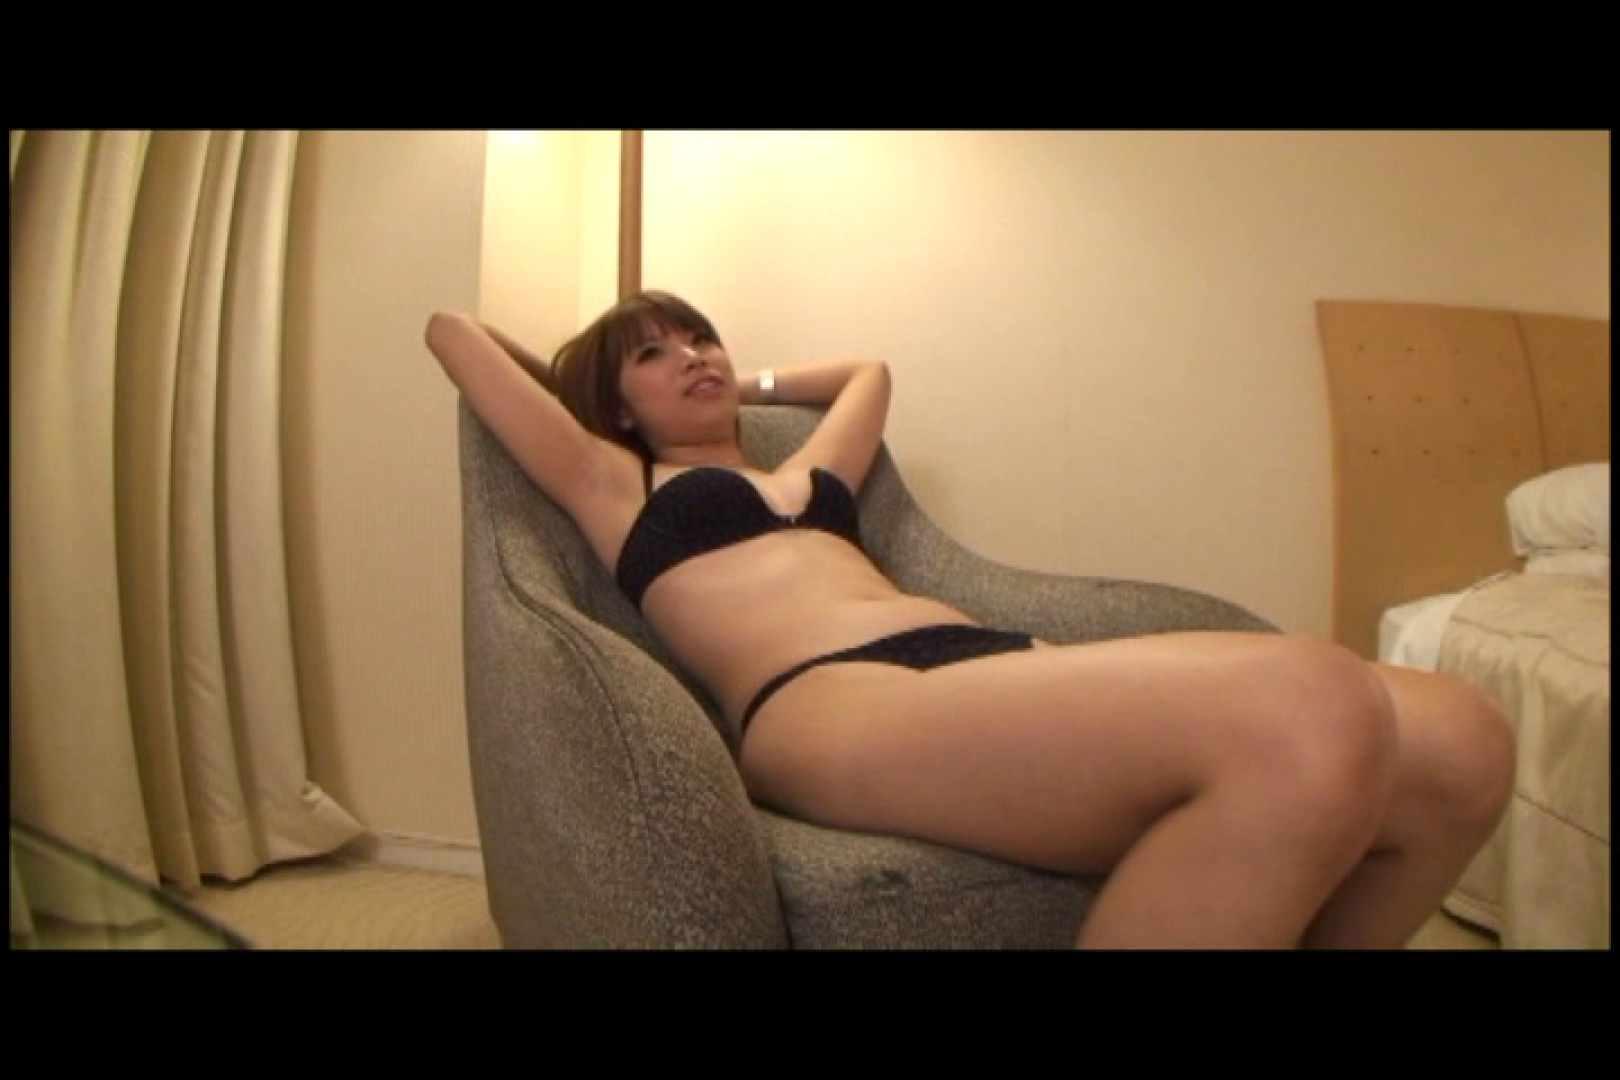 JDハンター全国ツアー vol.054 後編 女子大生のエロ動画 | 0  113PIX 49